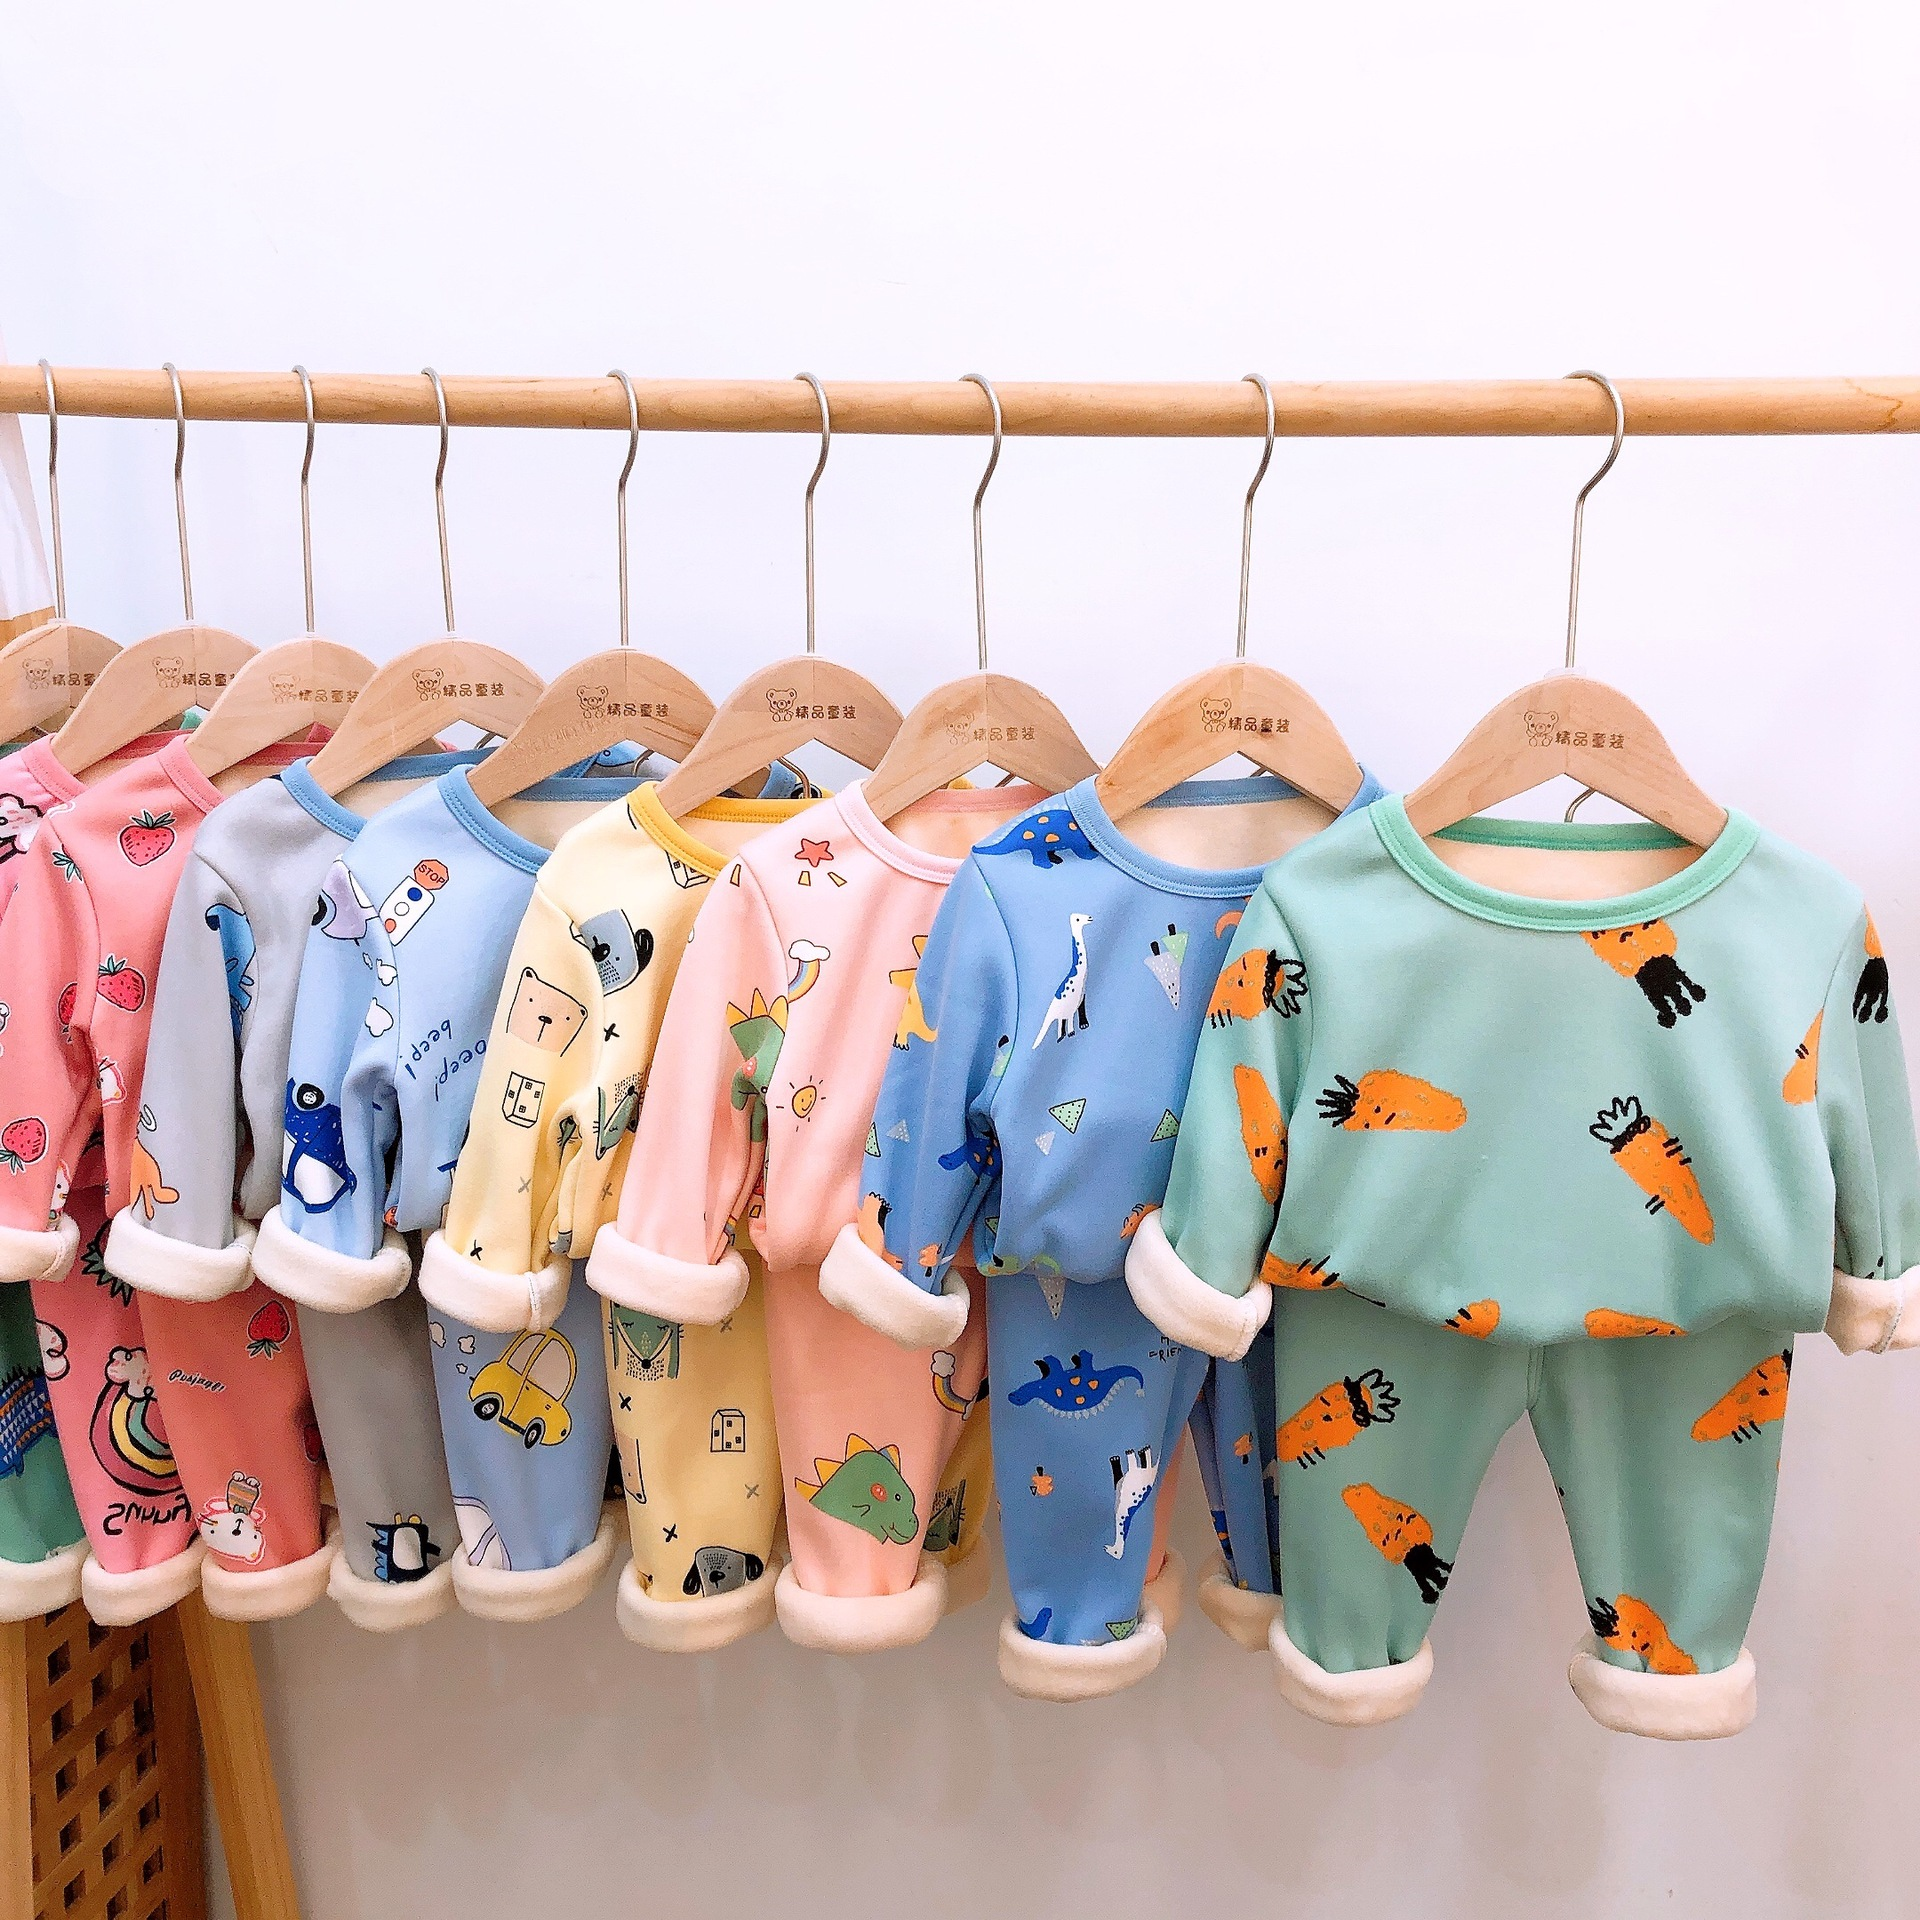 2020 Autumn Winter Thicken Velvet Children Pajamas Cartoon Family Boys Girls Clothing Set Kids Casual Sleepwear Suits Clothes 1